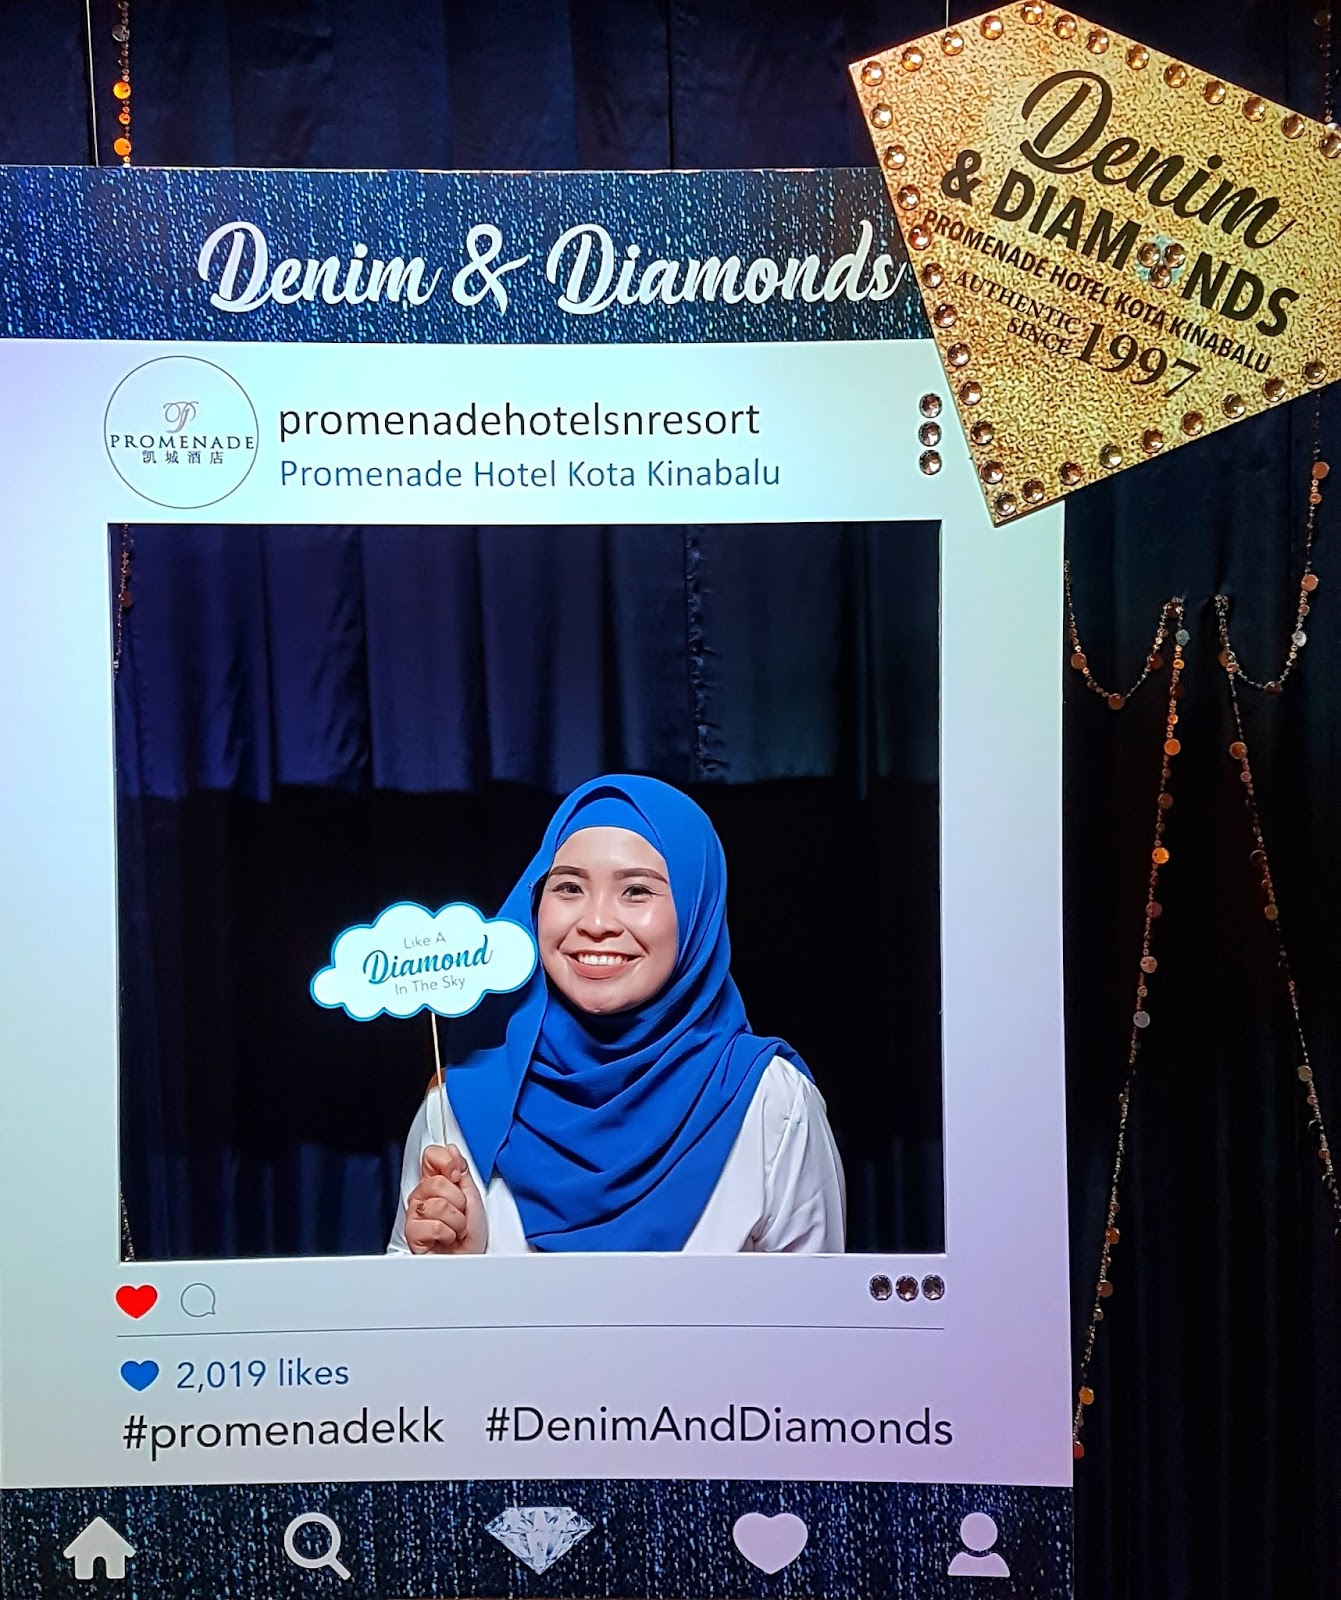 Makan Malam Bertemakan Denim Diamonds Bersama Promenade Hotel Kota Kinabalu Junzie Life Is A Beautiful Struggle